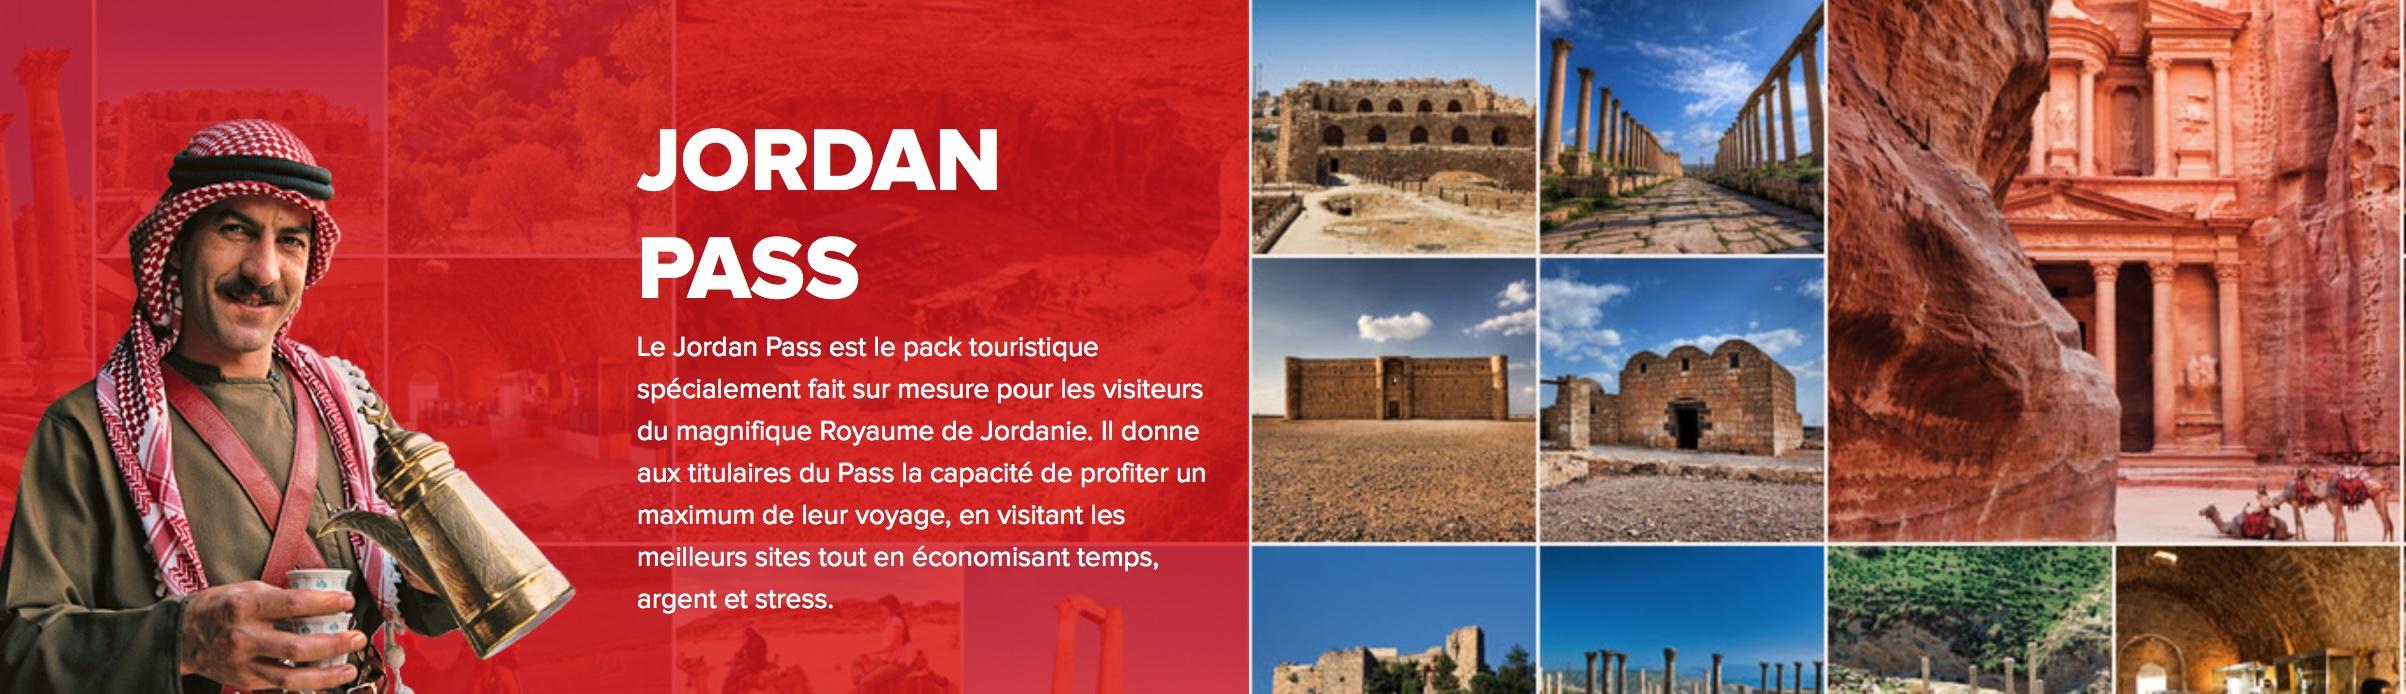 jordan pass, jordanie